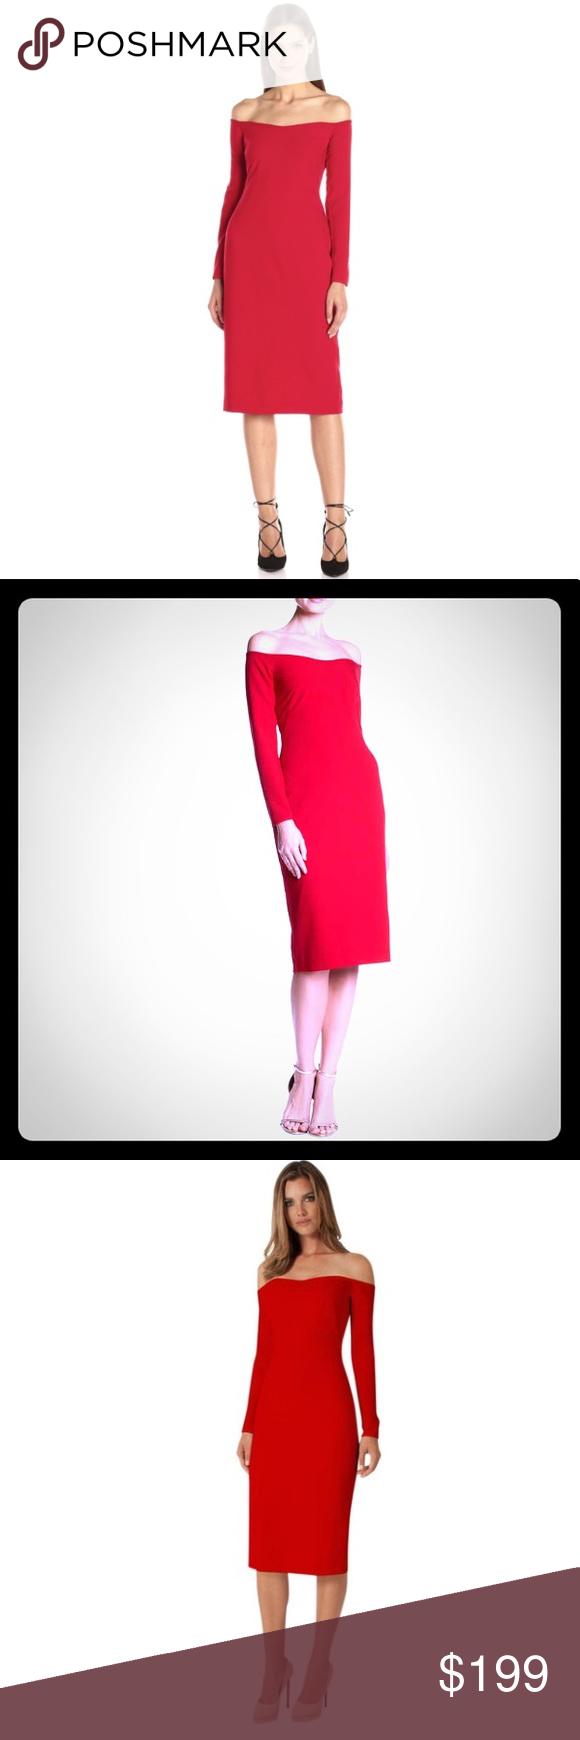 Black halo vita off the shoulder dress red sz nwt wear store